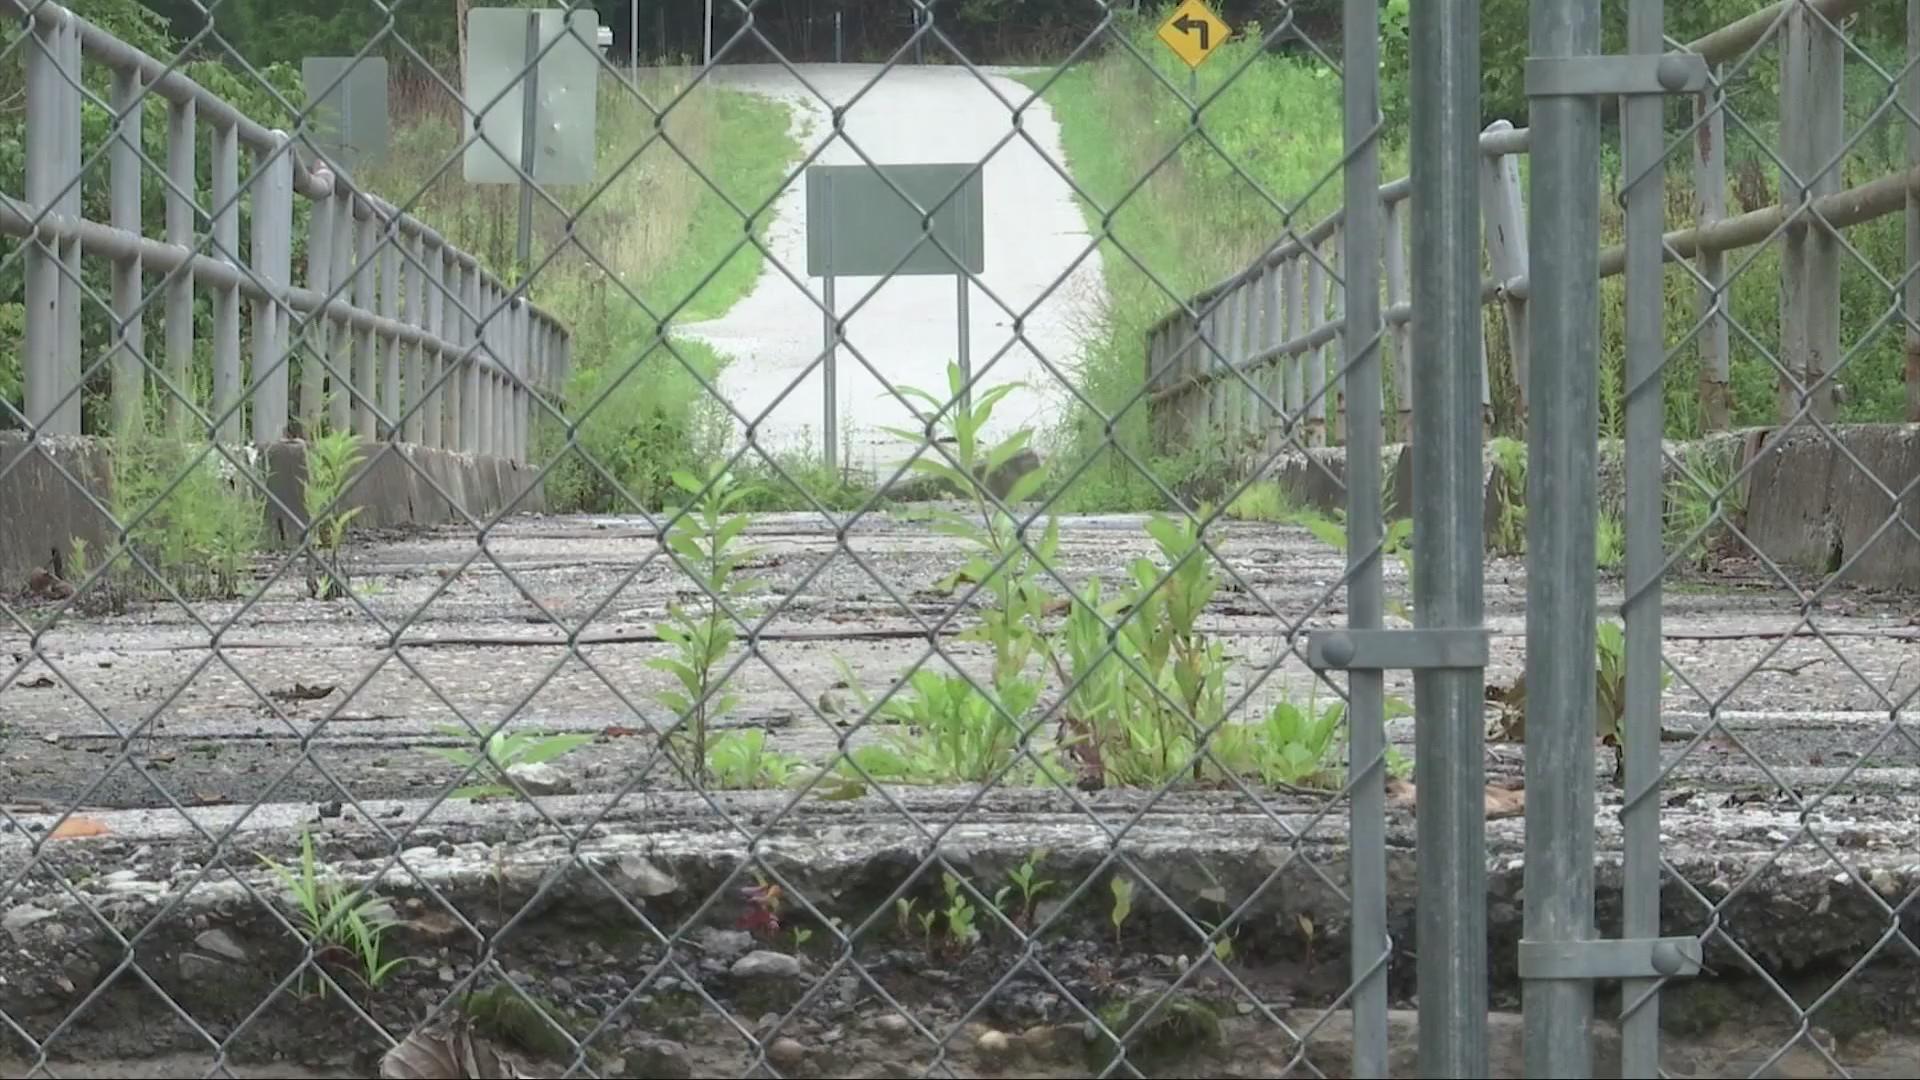 Residents Feeling Forgotten Given Bridge's Condition